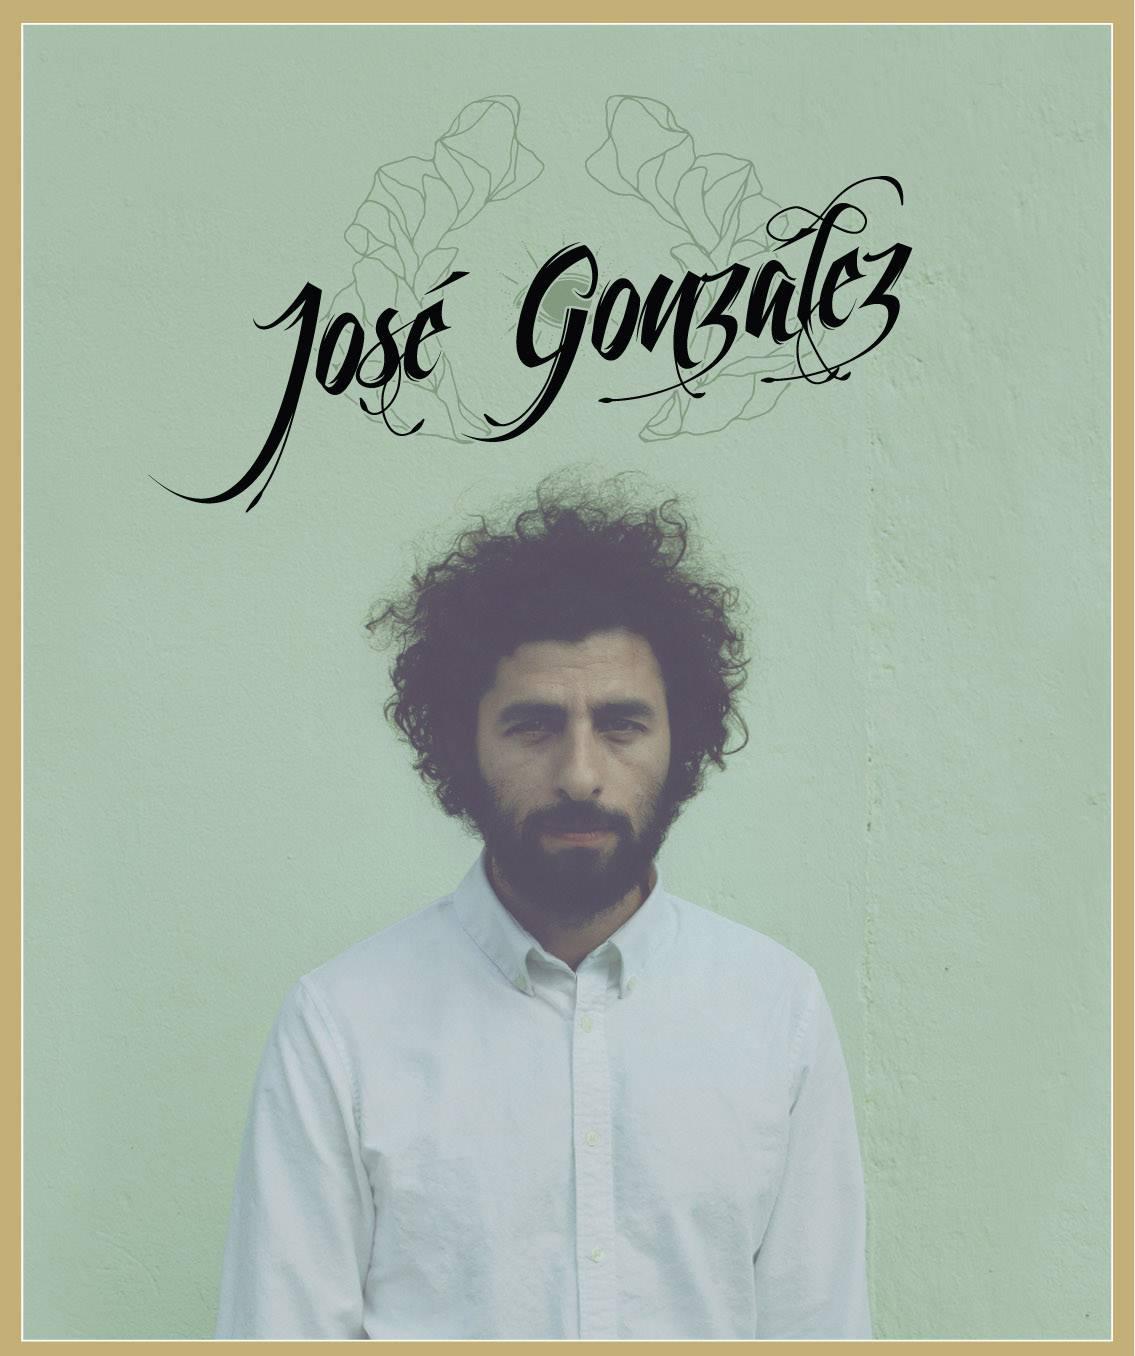 Jose_Gonzalez_Plaza_Condesa_2016